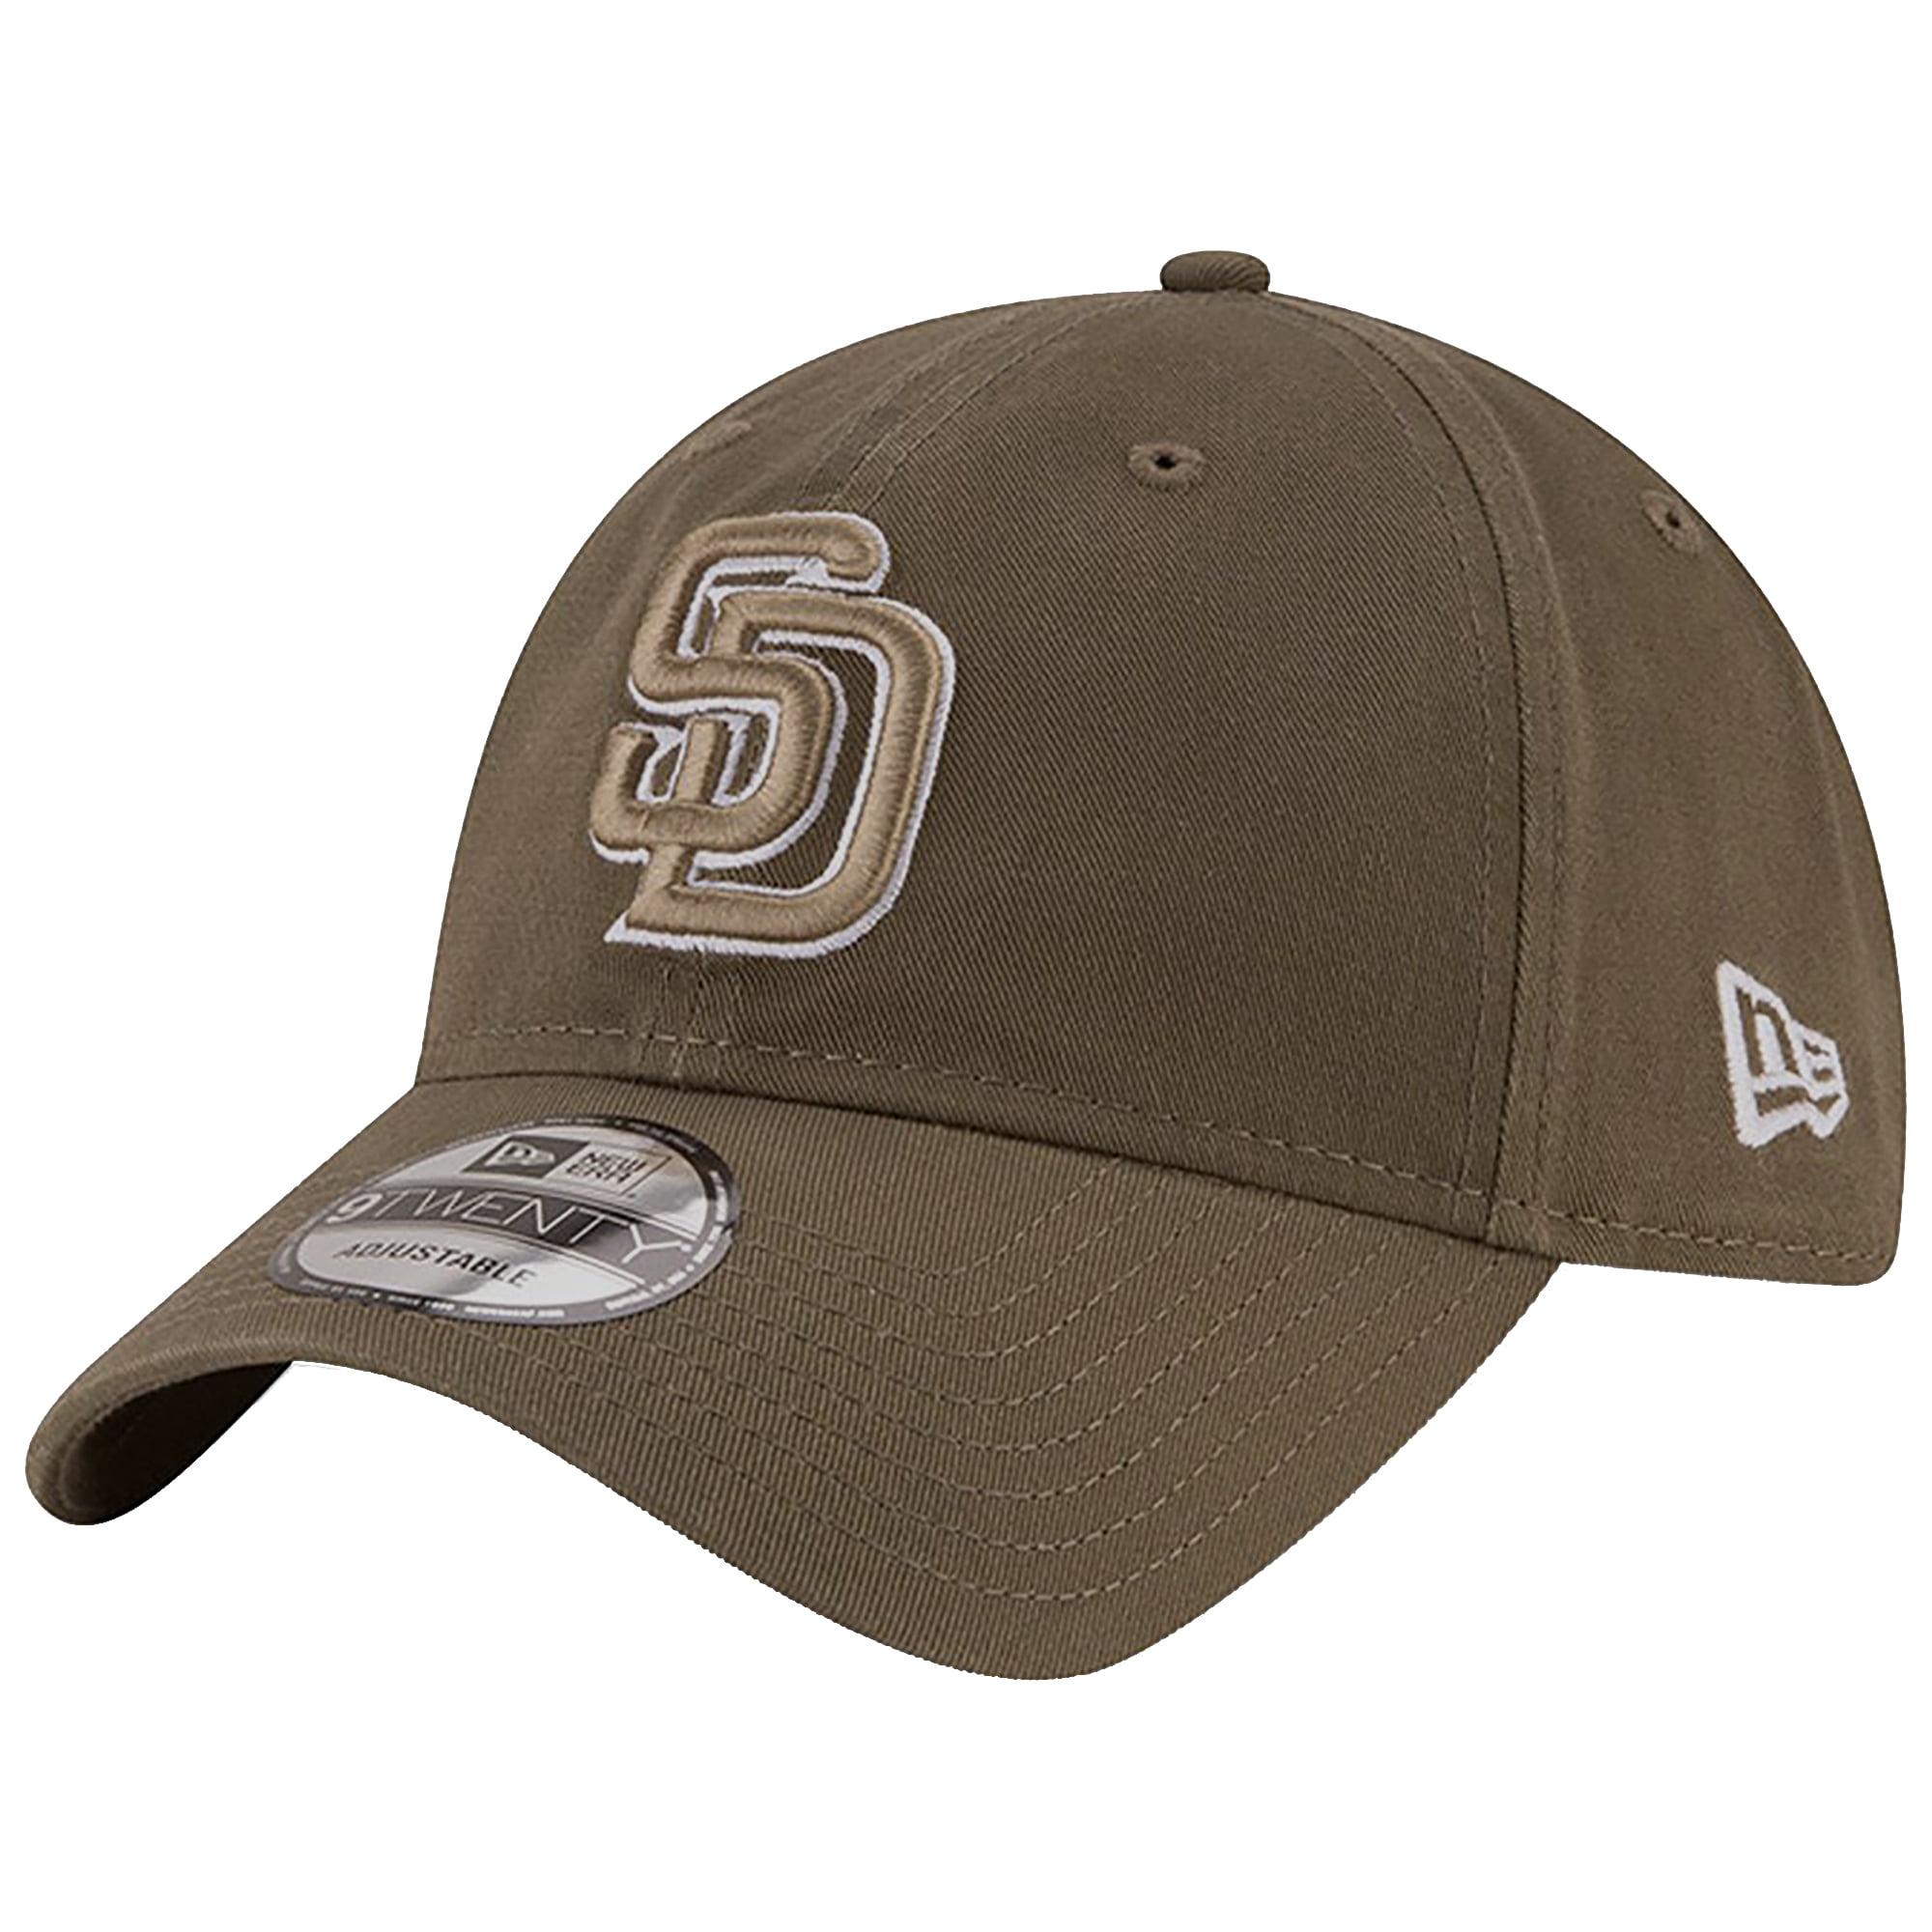 San Diego Padres New Era Alternate Replica Core Classic 9TWENTY Adjustable Hat - Olive - OSFA